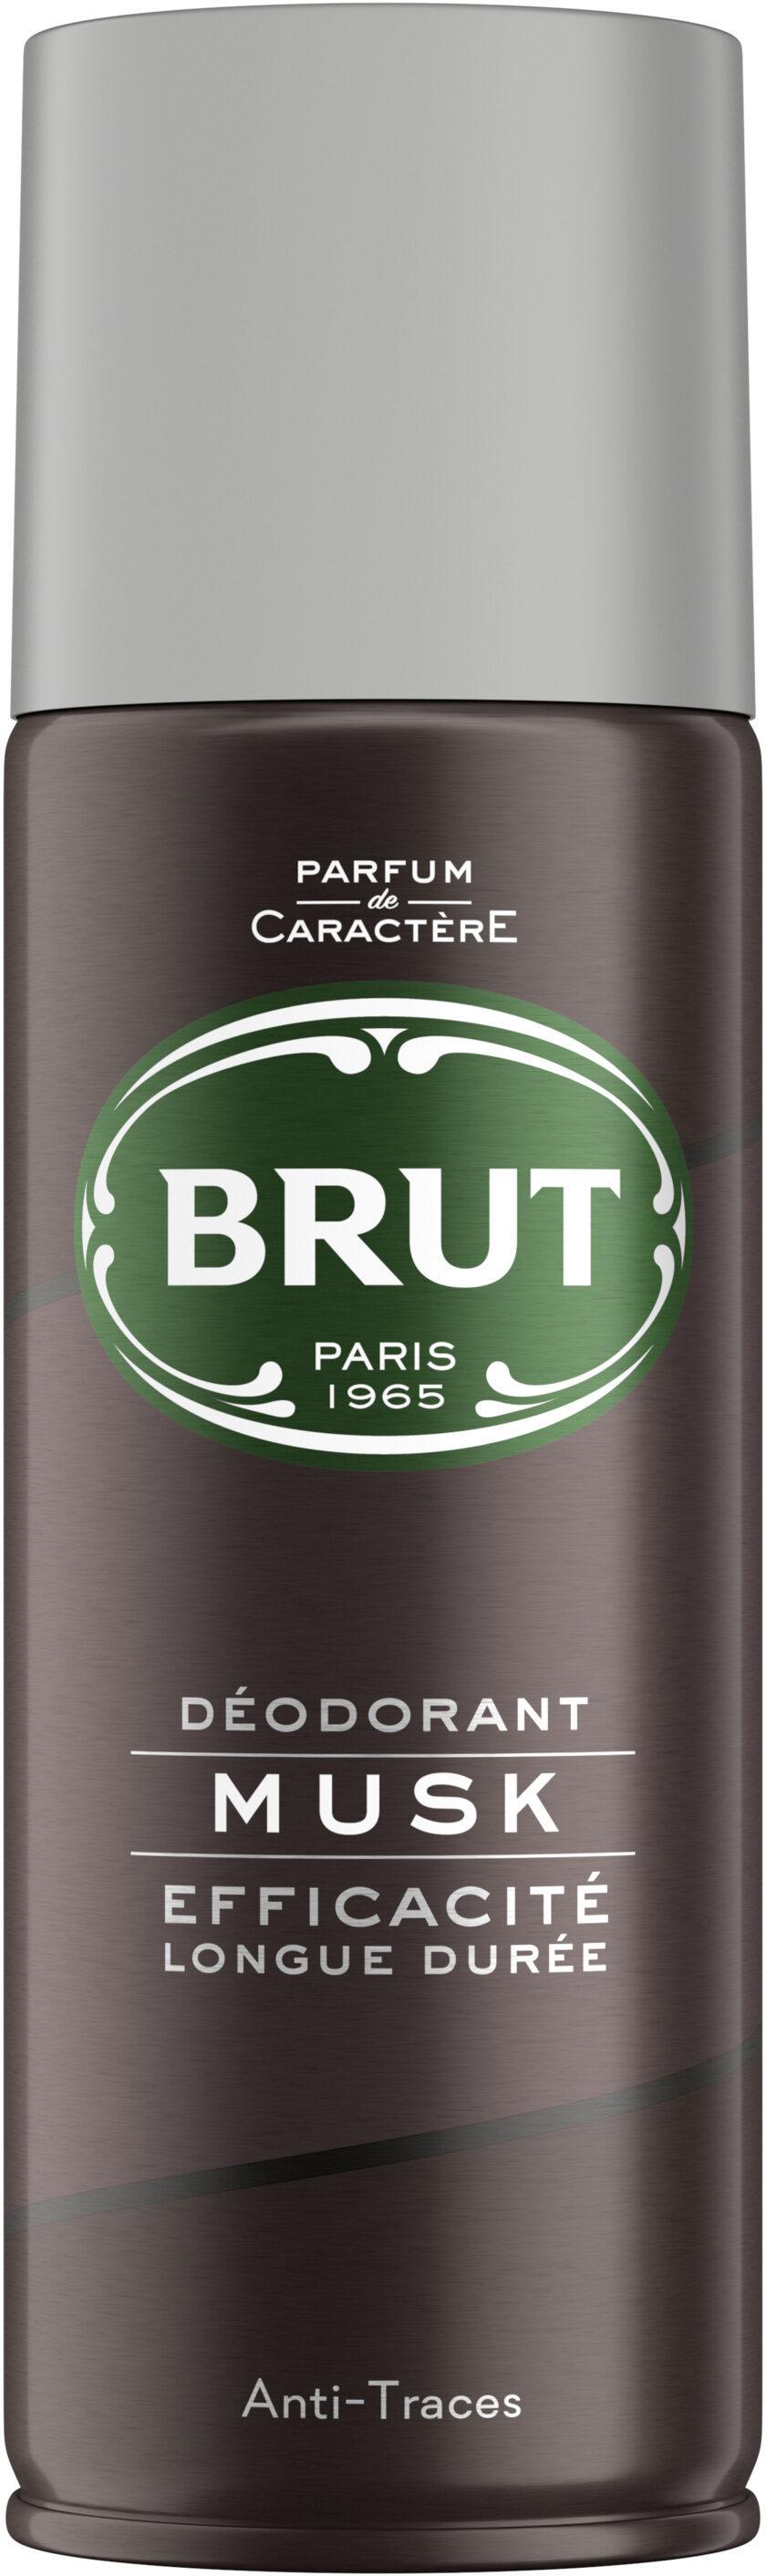 Brut Déodorant Homme Spray Musk - Product - fr